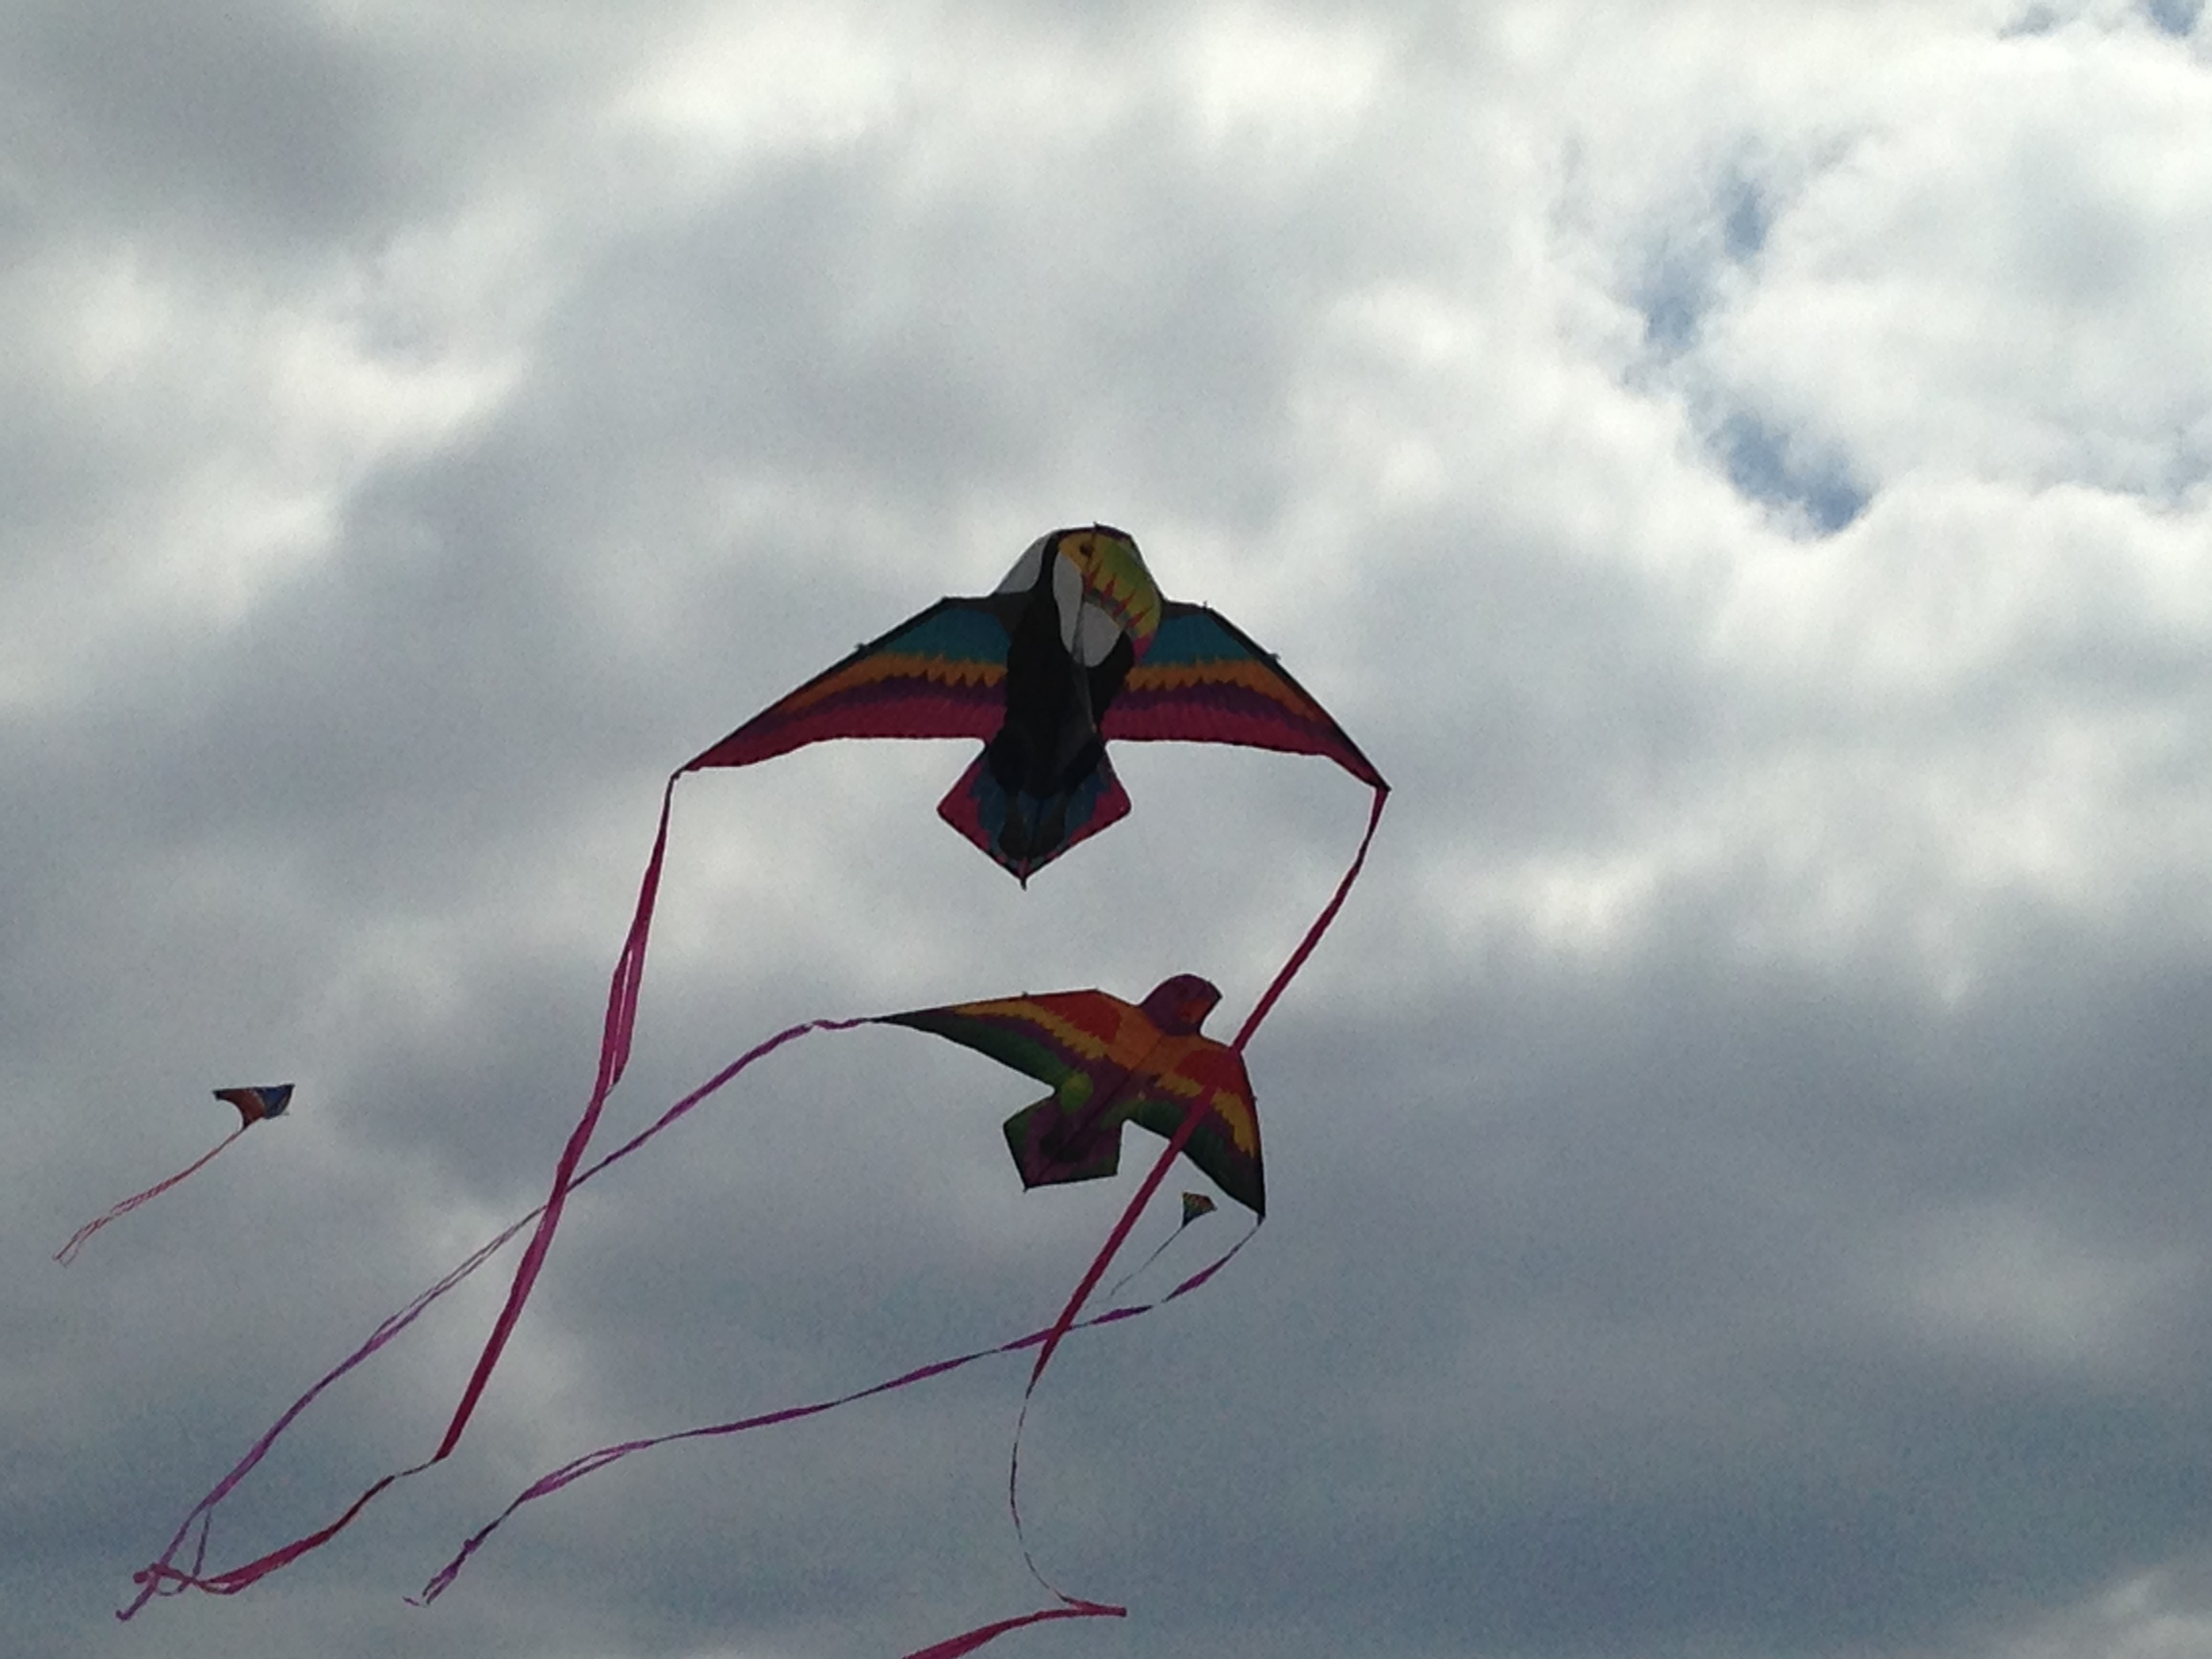 Kite Festival on the Mall